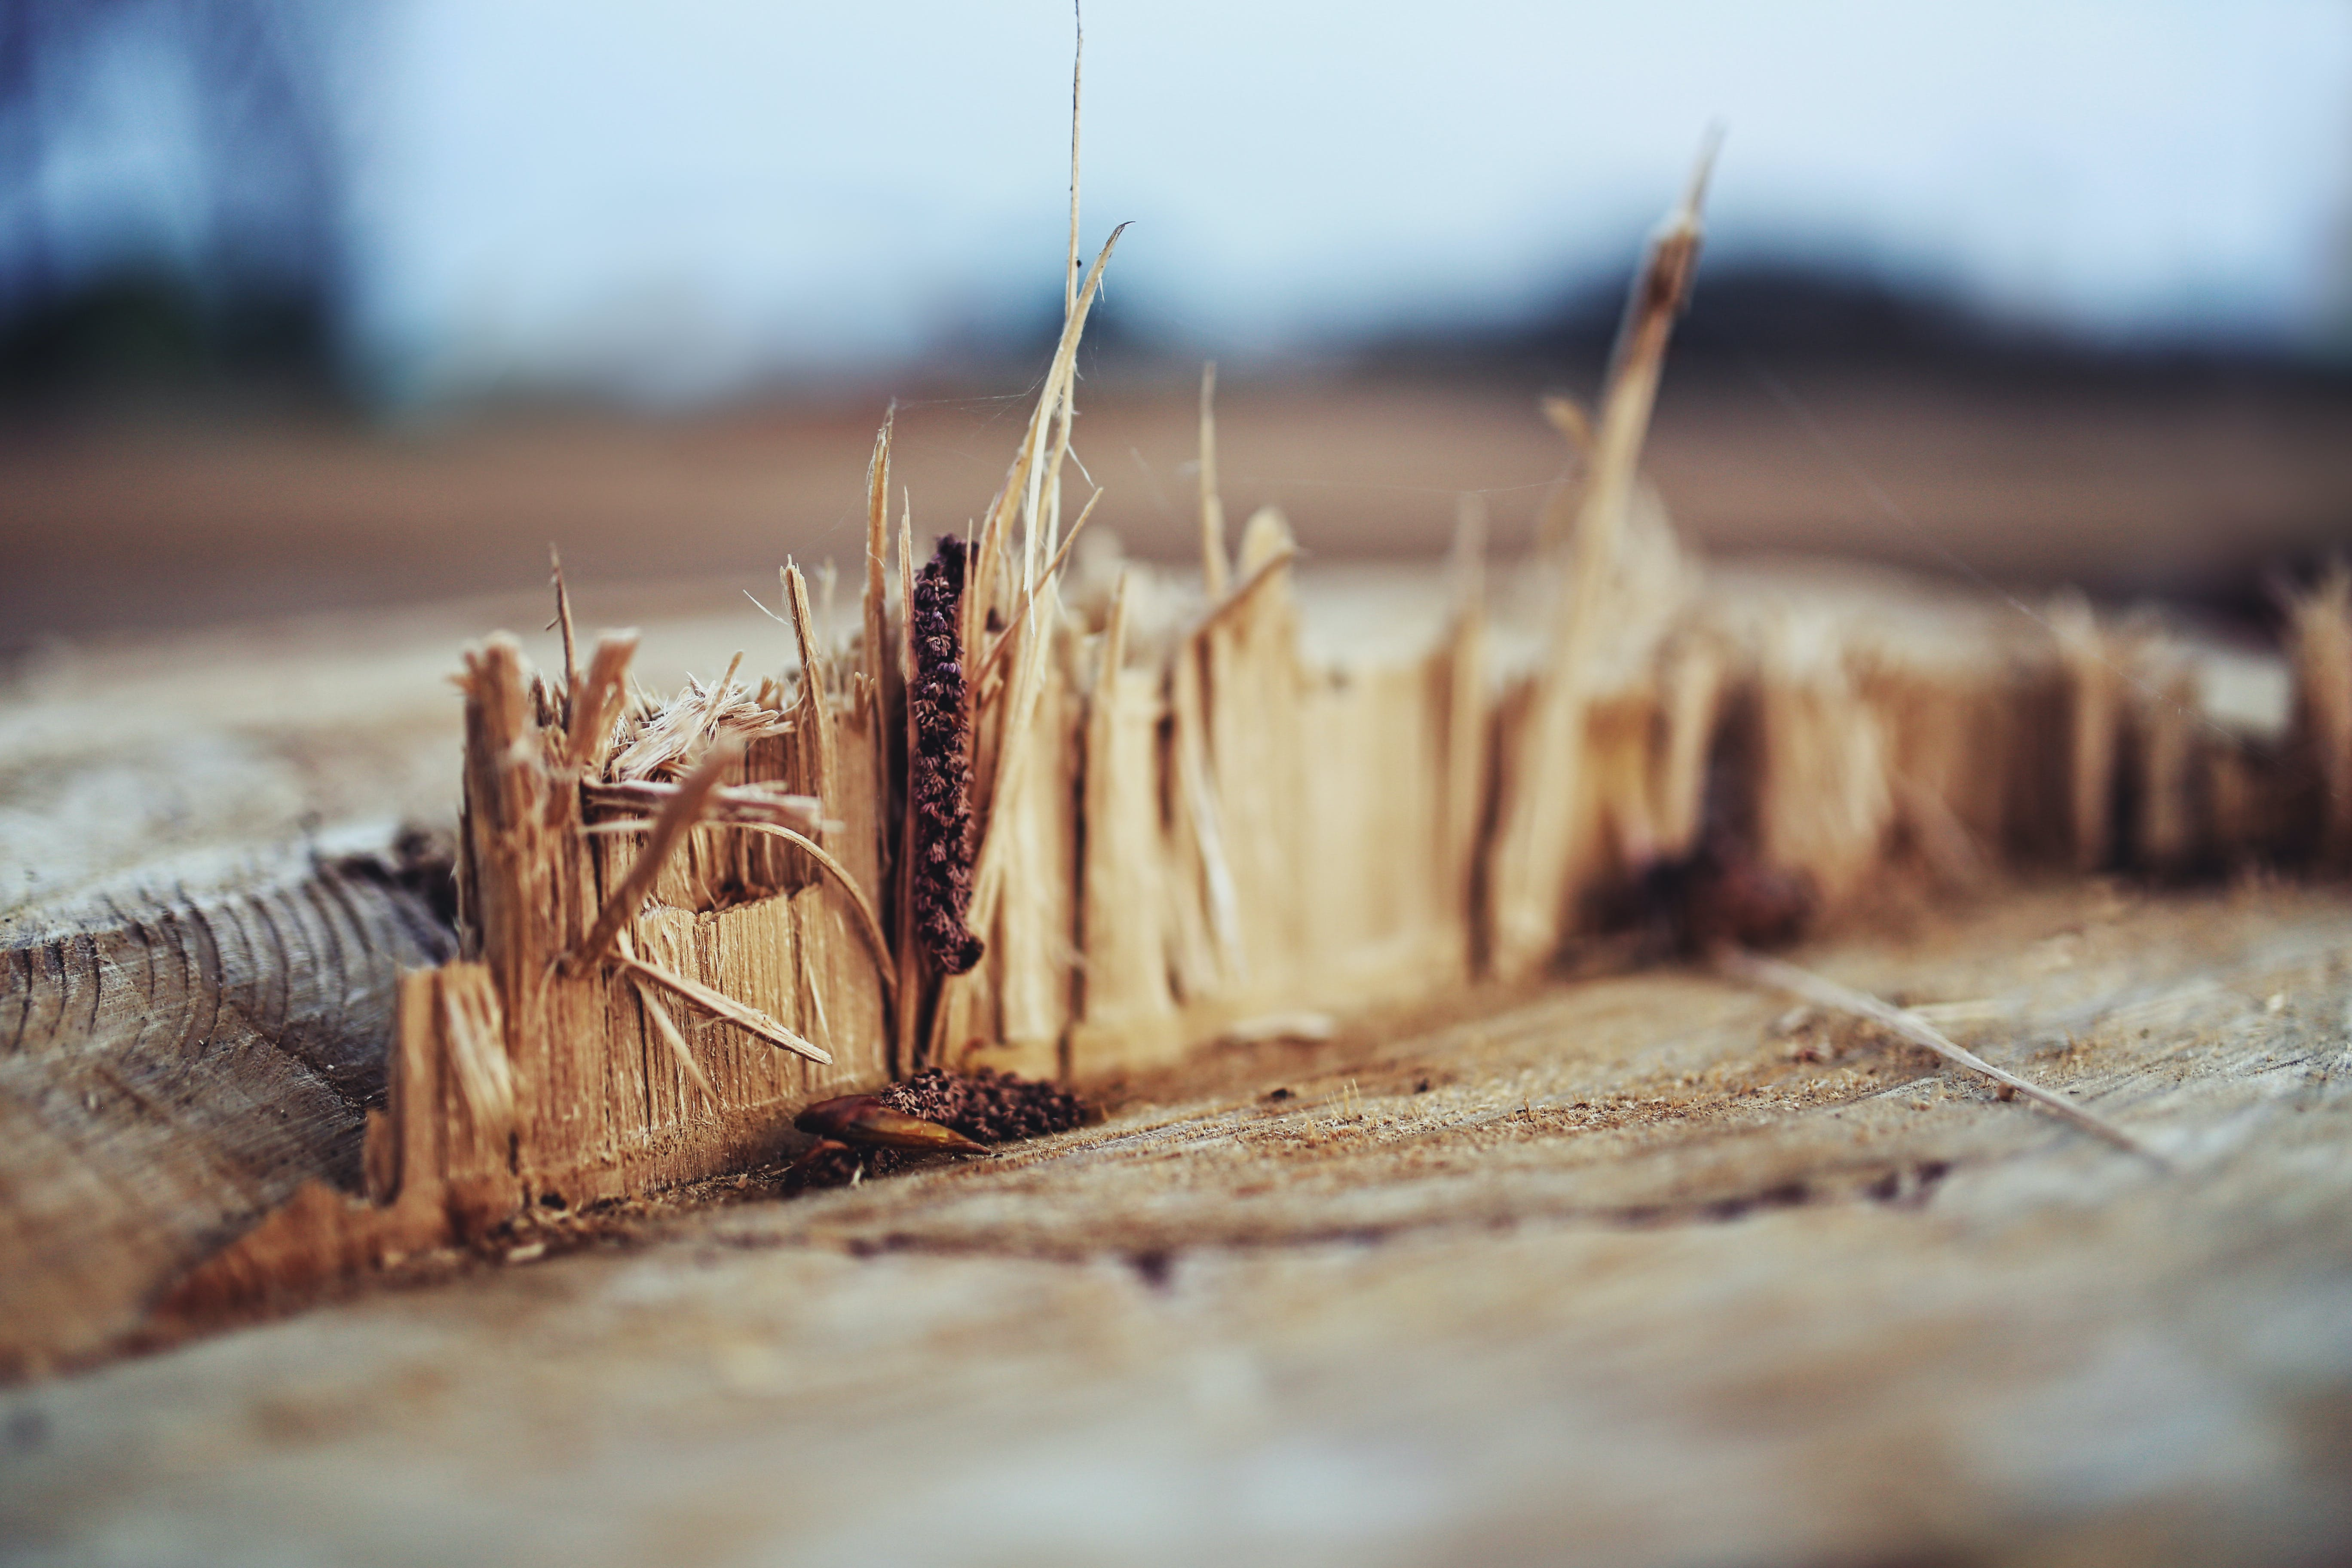 Wood shreds